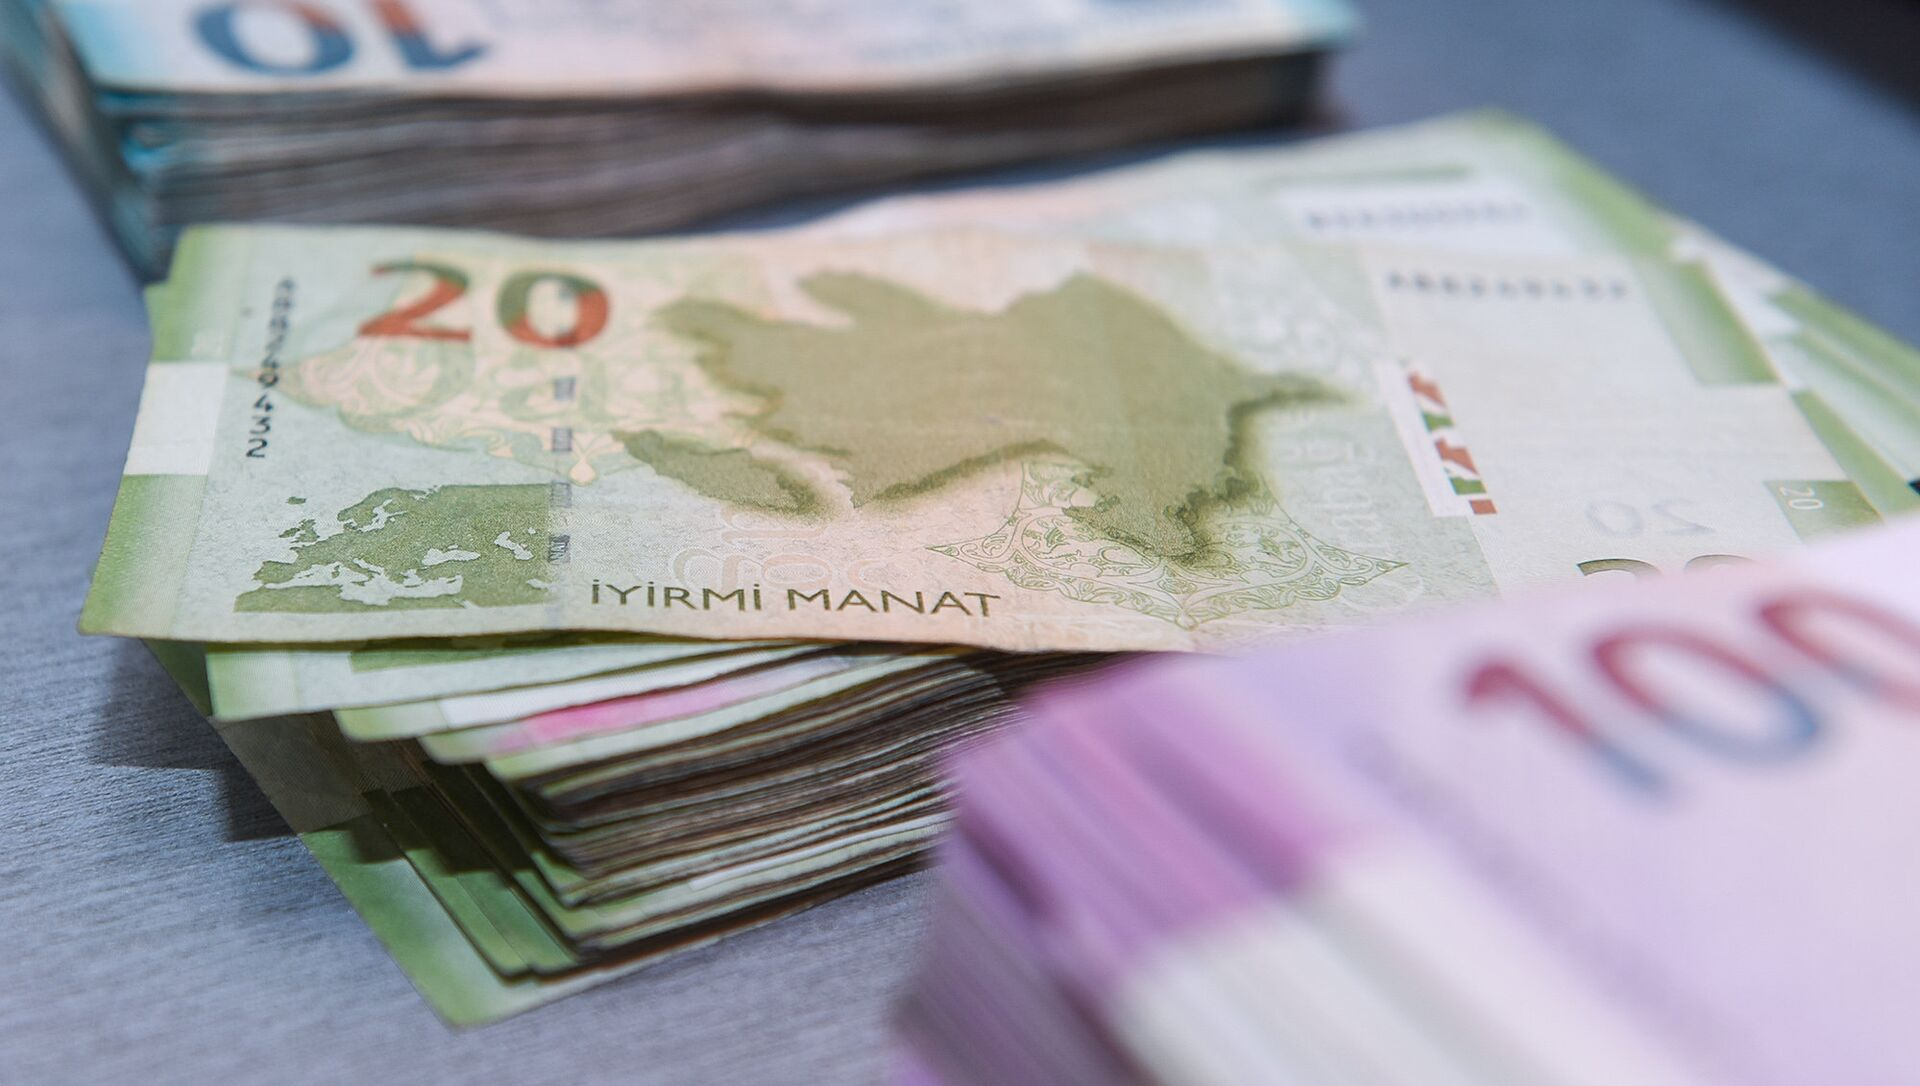 Деньги, азербайджанские манаты, банкноты - Sputnik Азербайджан, 1920, 12.02.2021